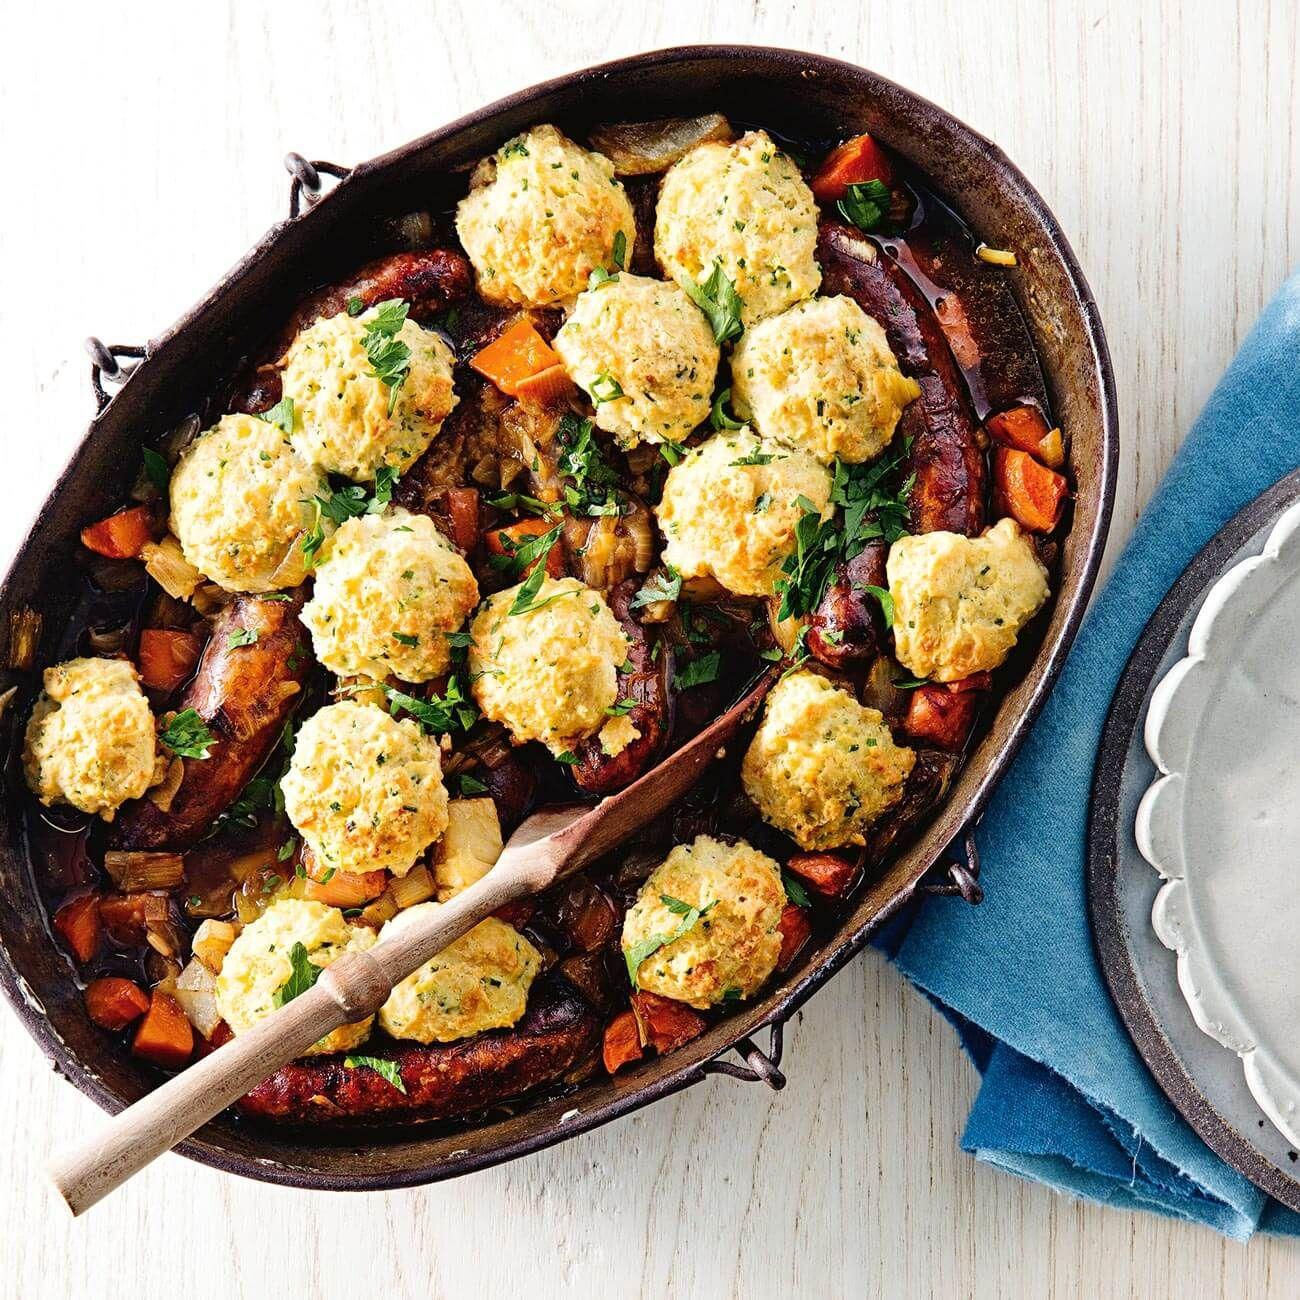 Sausage casserole with cheese dumplings recipe sausage